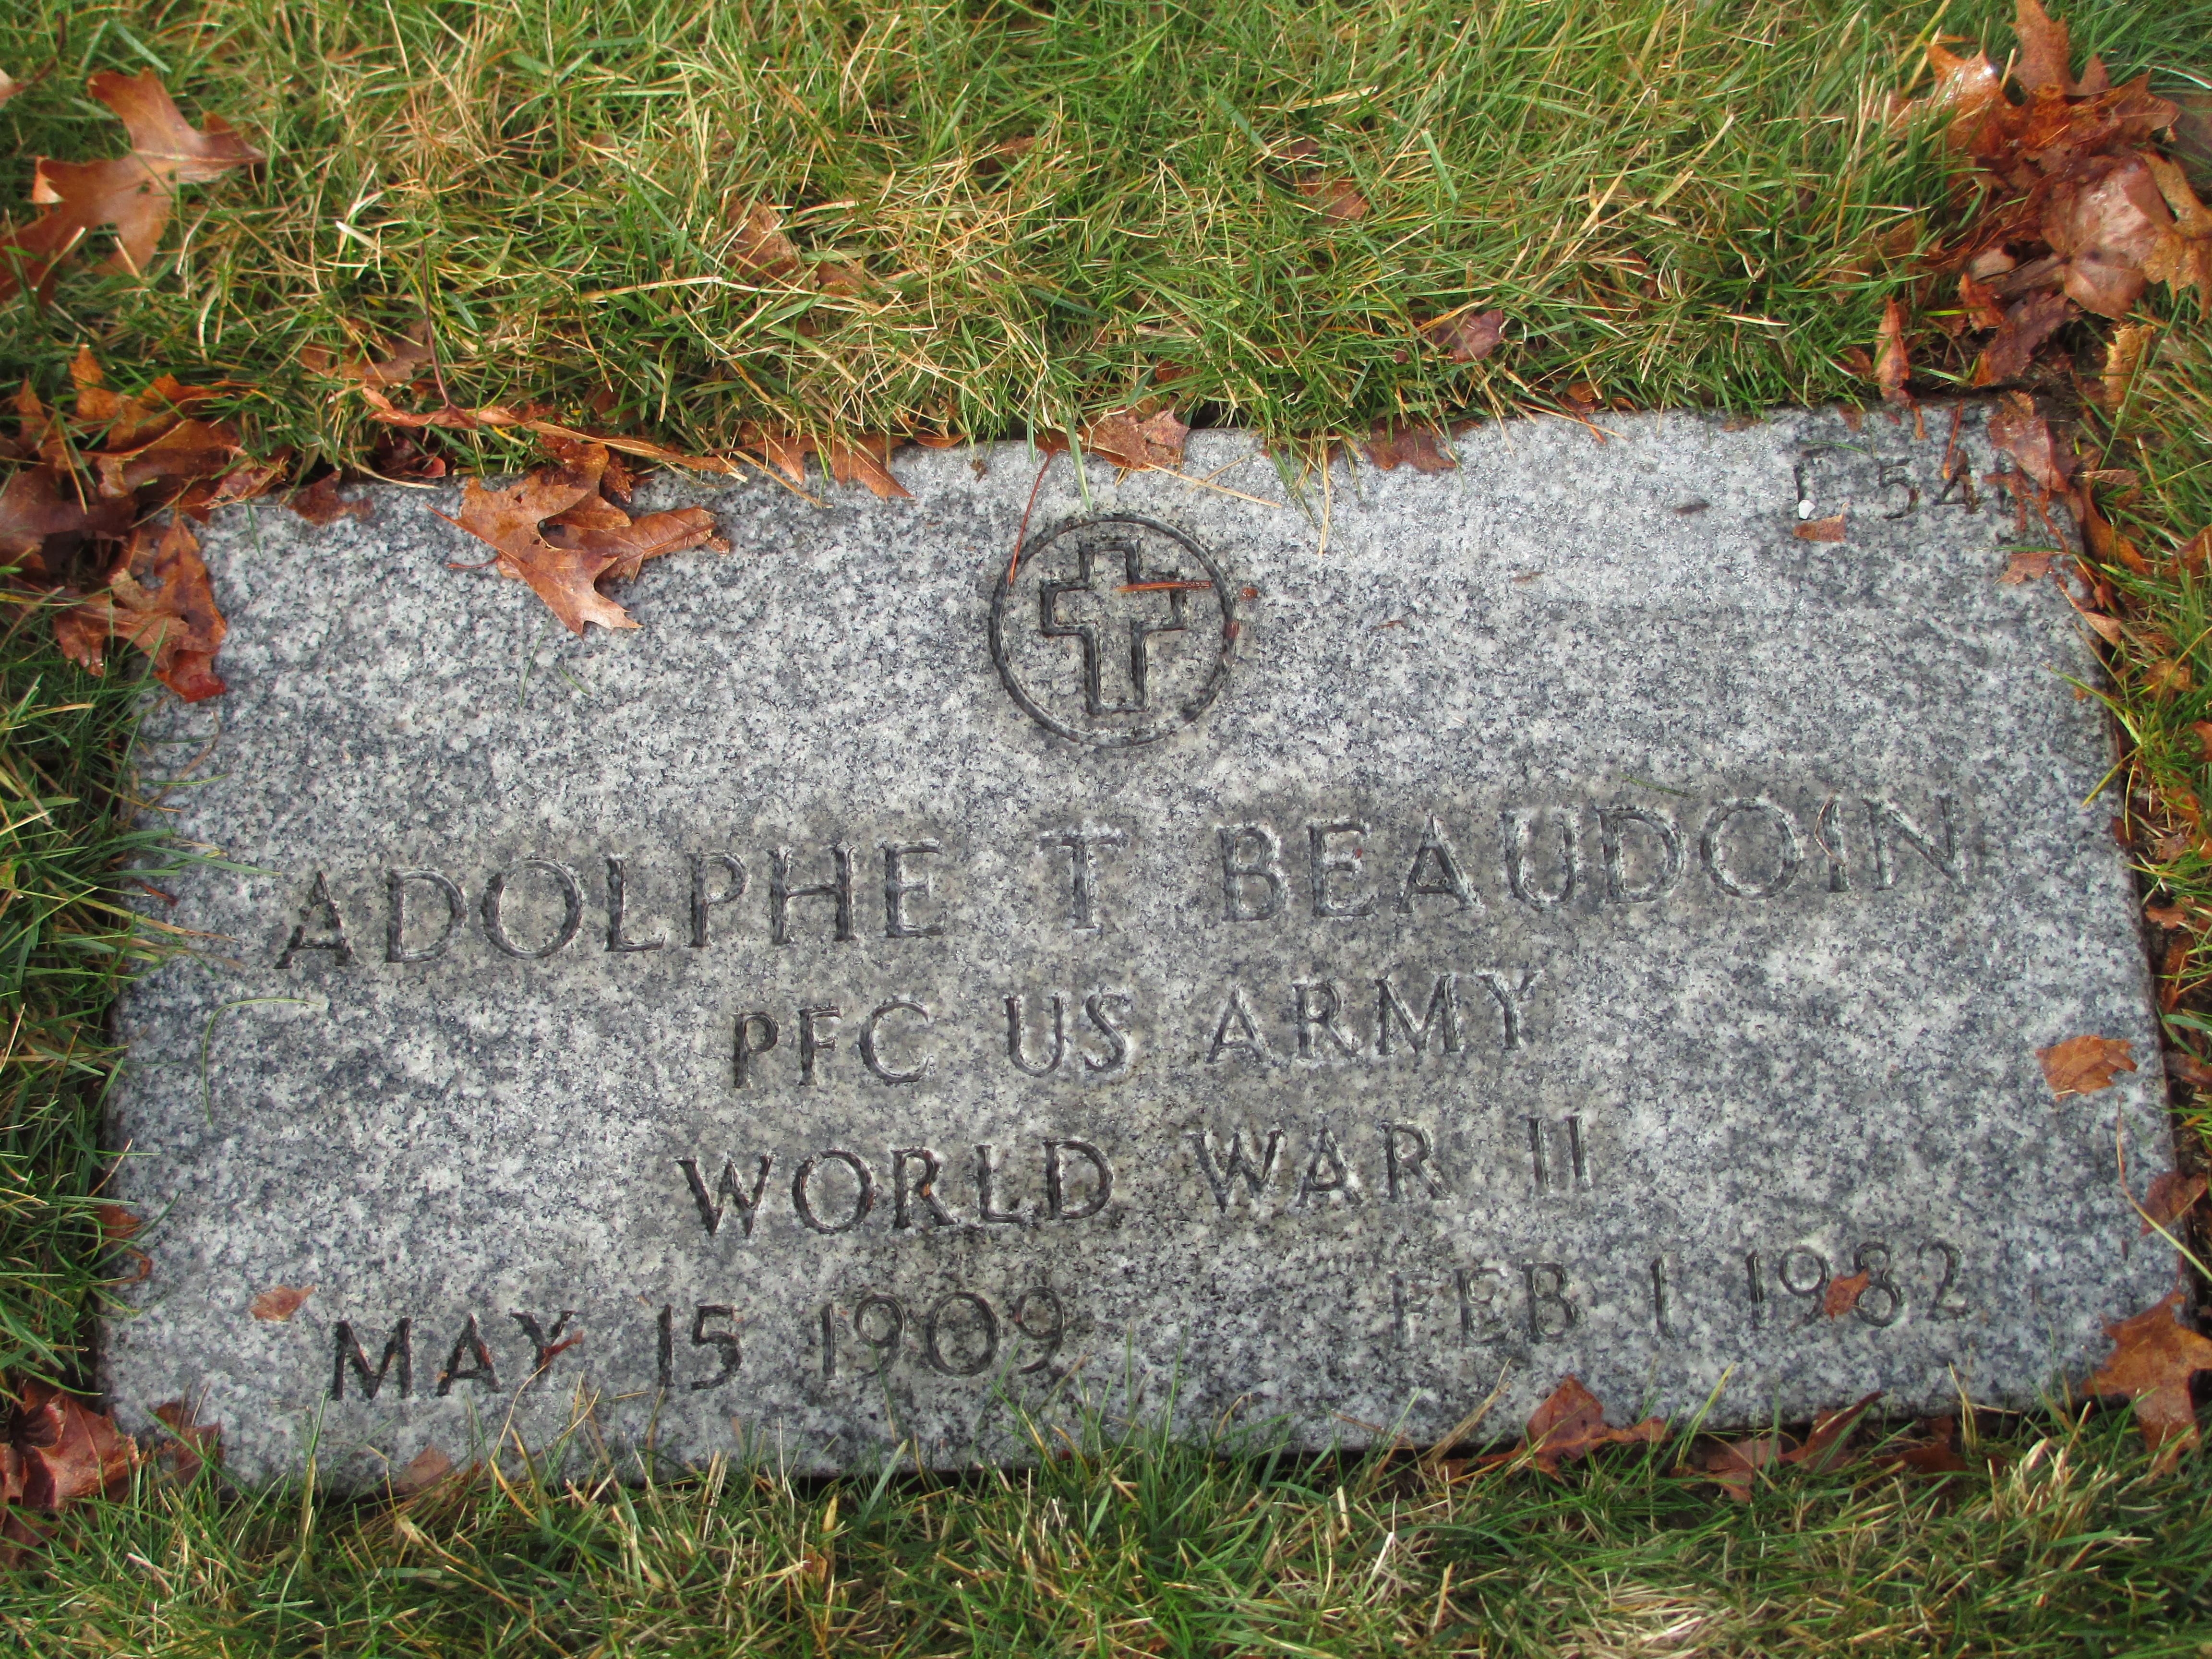 Adolphe T Beaudoin